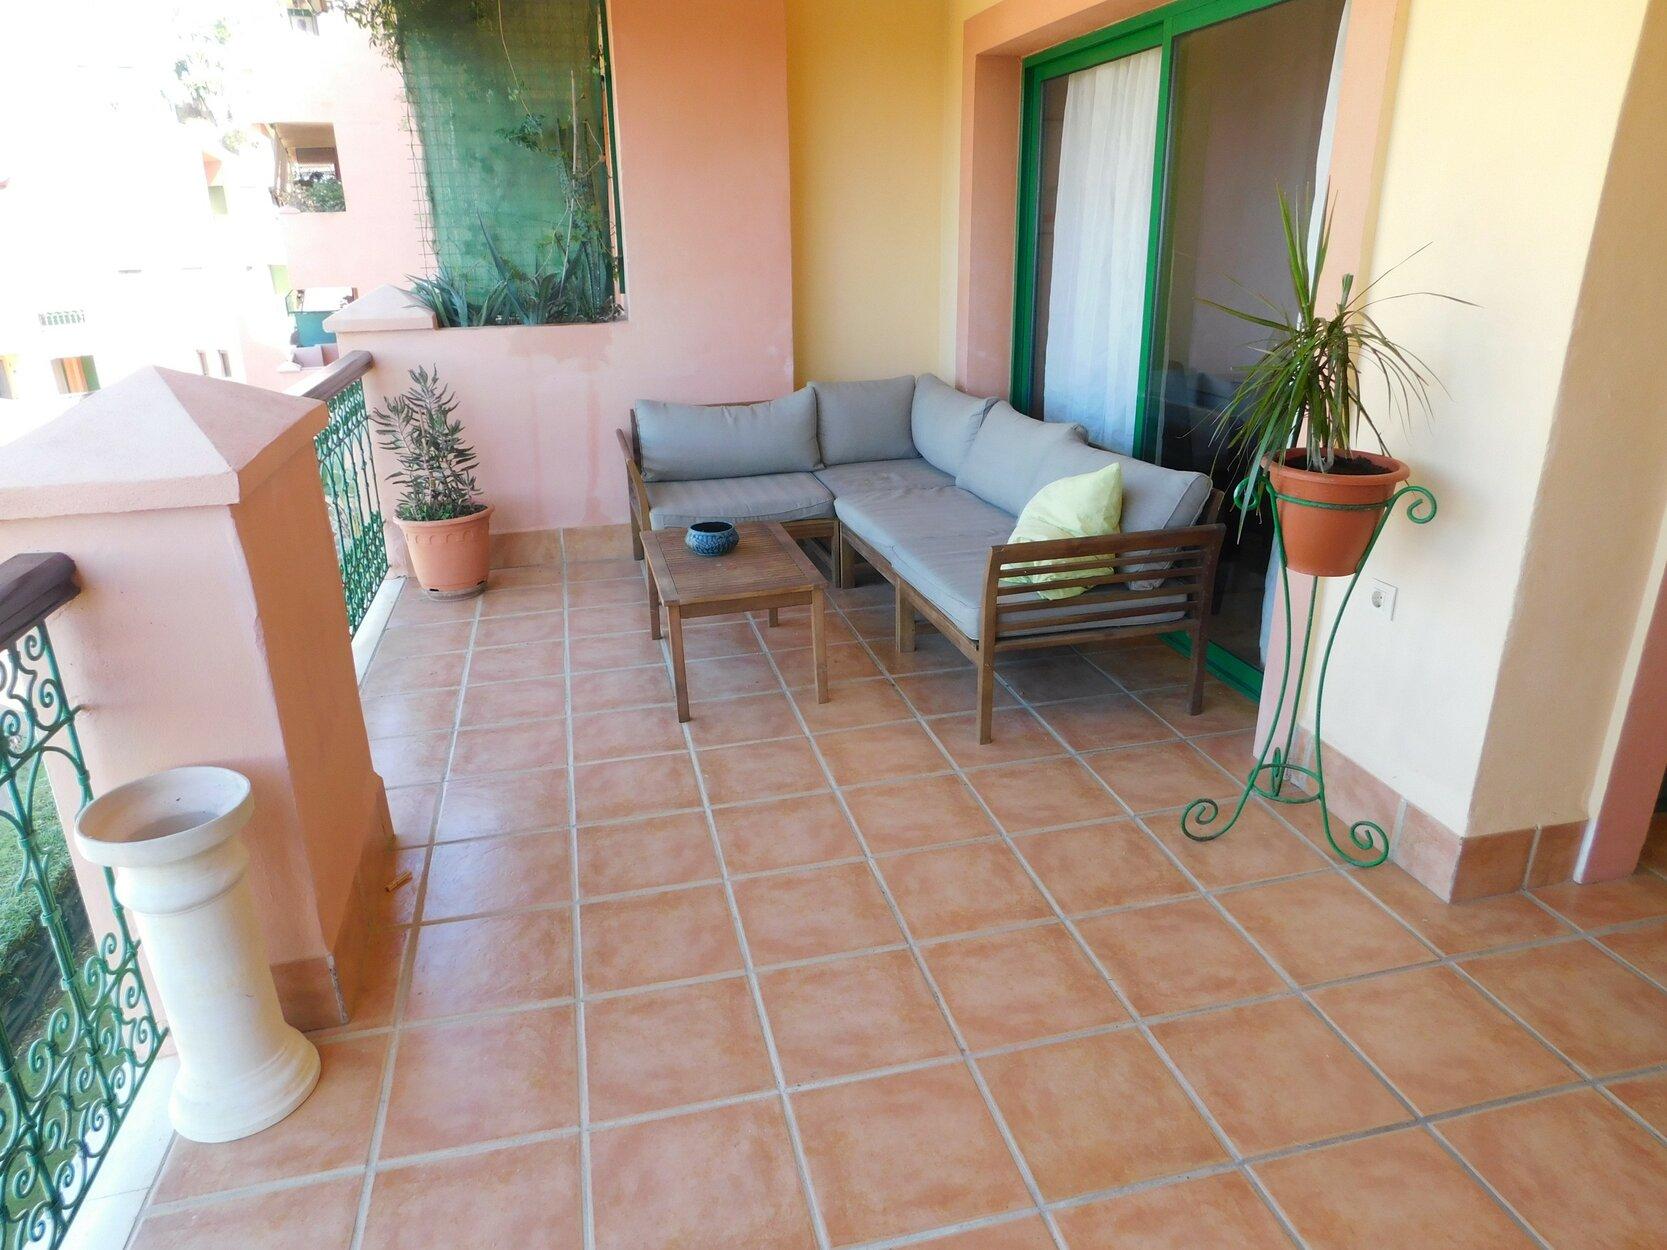 Apartment for sale in Fuengirola, Torreblanca del Sol